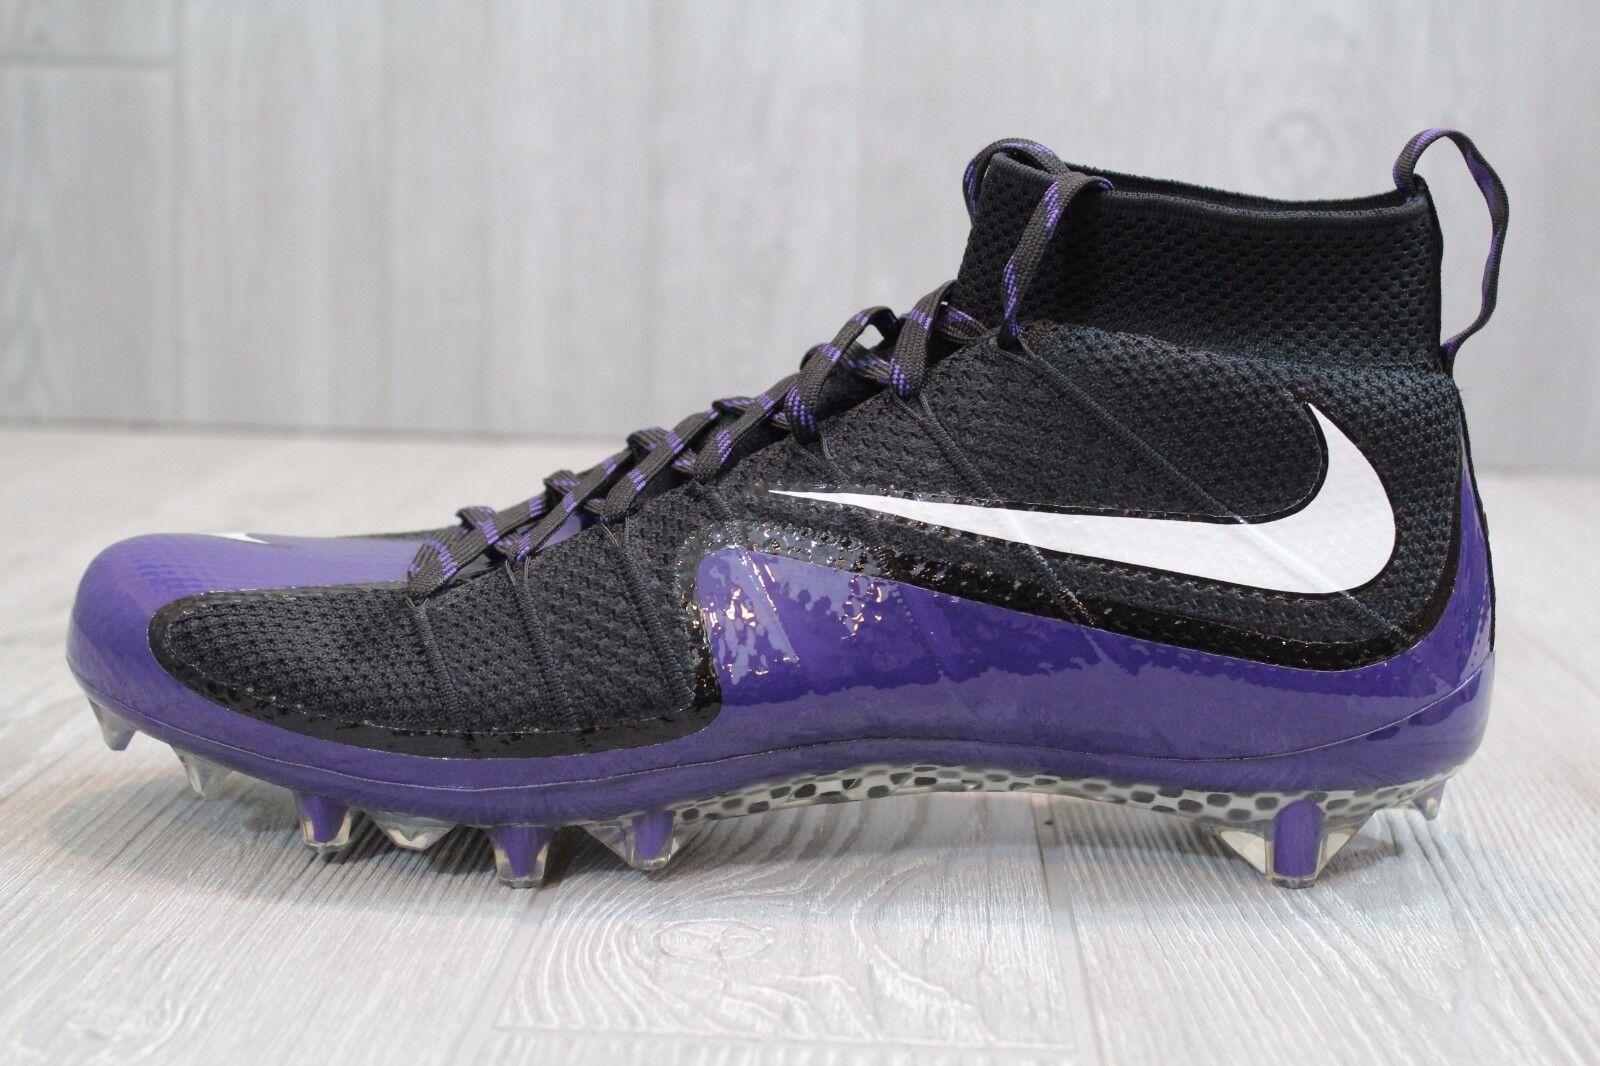 22 New Nike Vapor Untouchable Football Cleats Black Purple 707455-003 12.5, 13